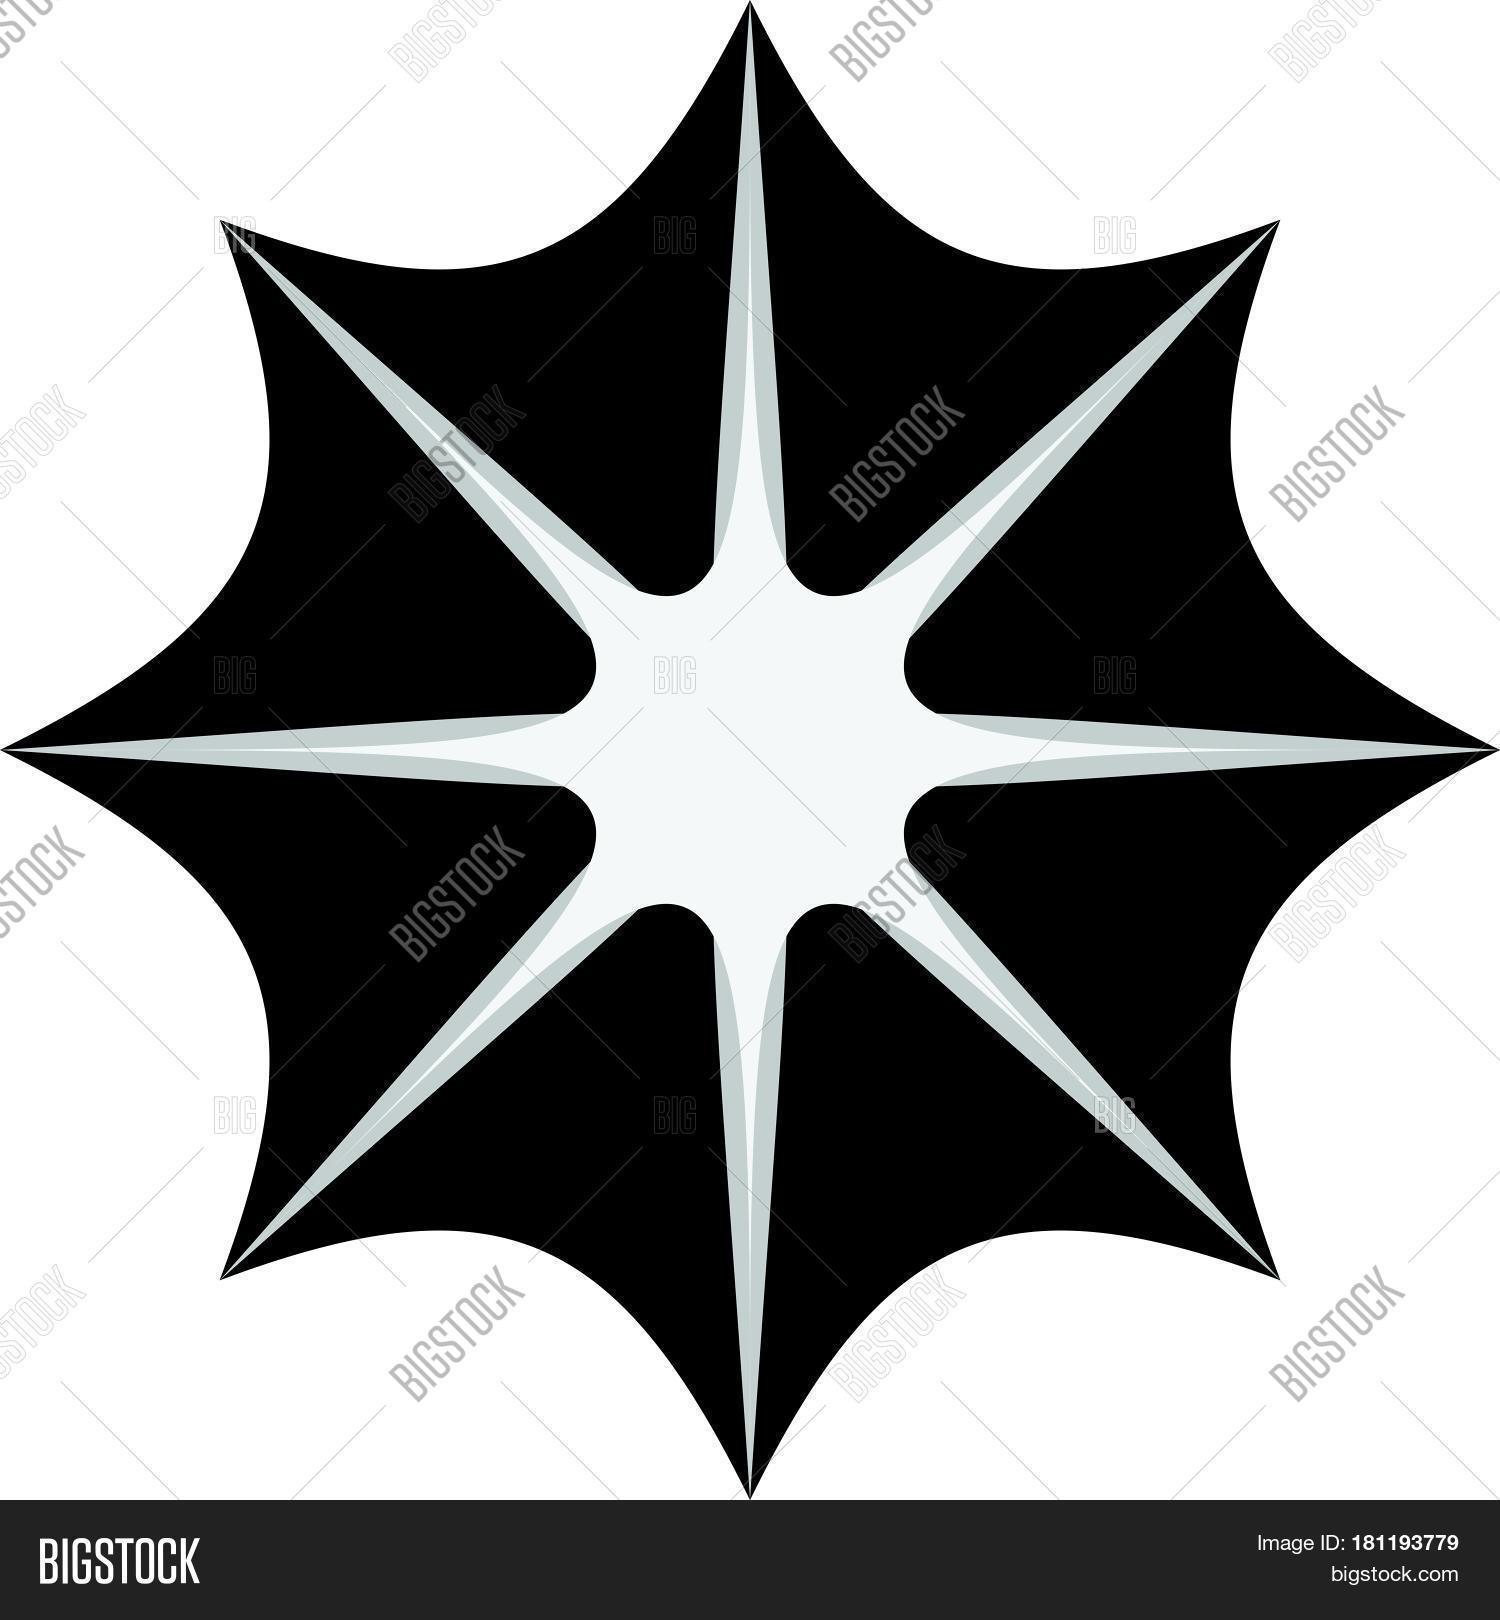 Starburst, Sunburst Vector & Photo (Free Trial) | Bigstock